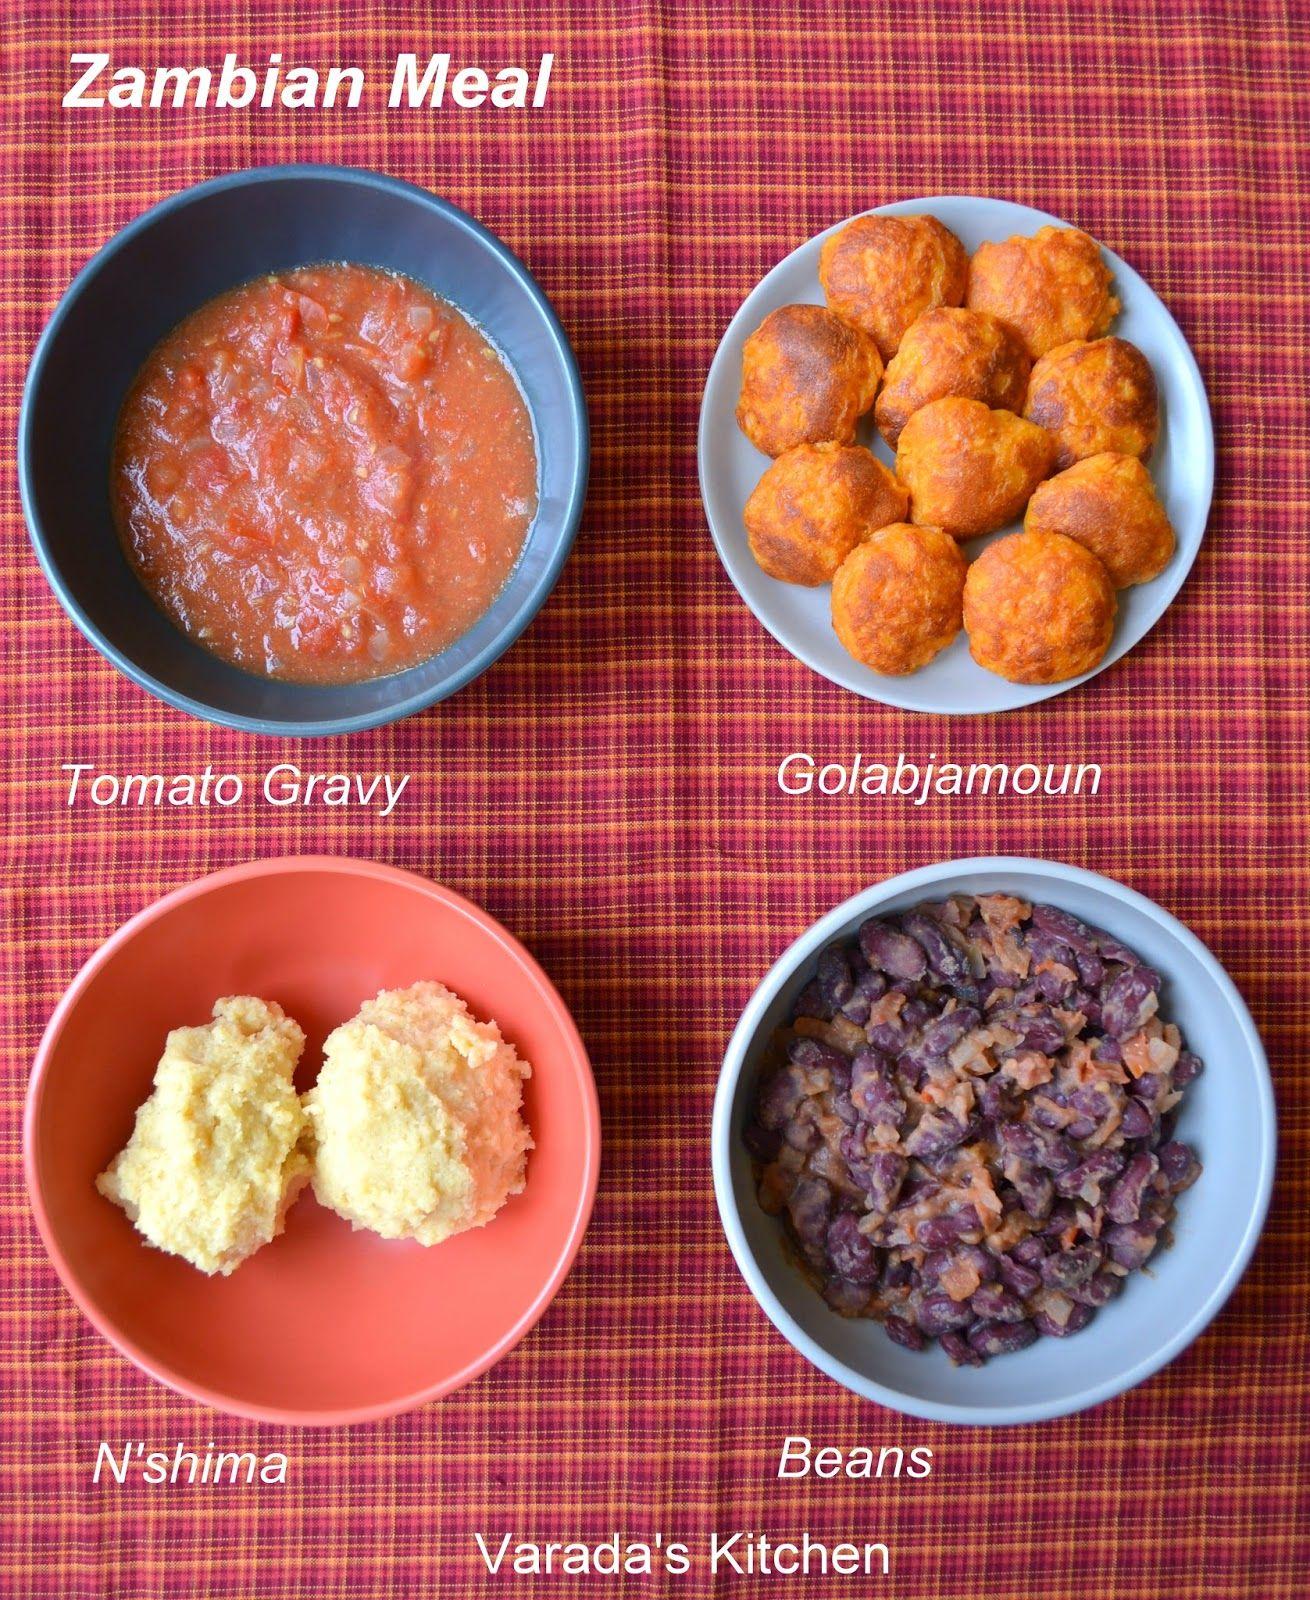 Y yum yums food of zambia varadas kitchen zambian meal zambia y yum yums food of zambia varadas kitchen zambian meal forumfinder Image collections